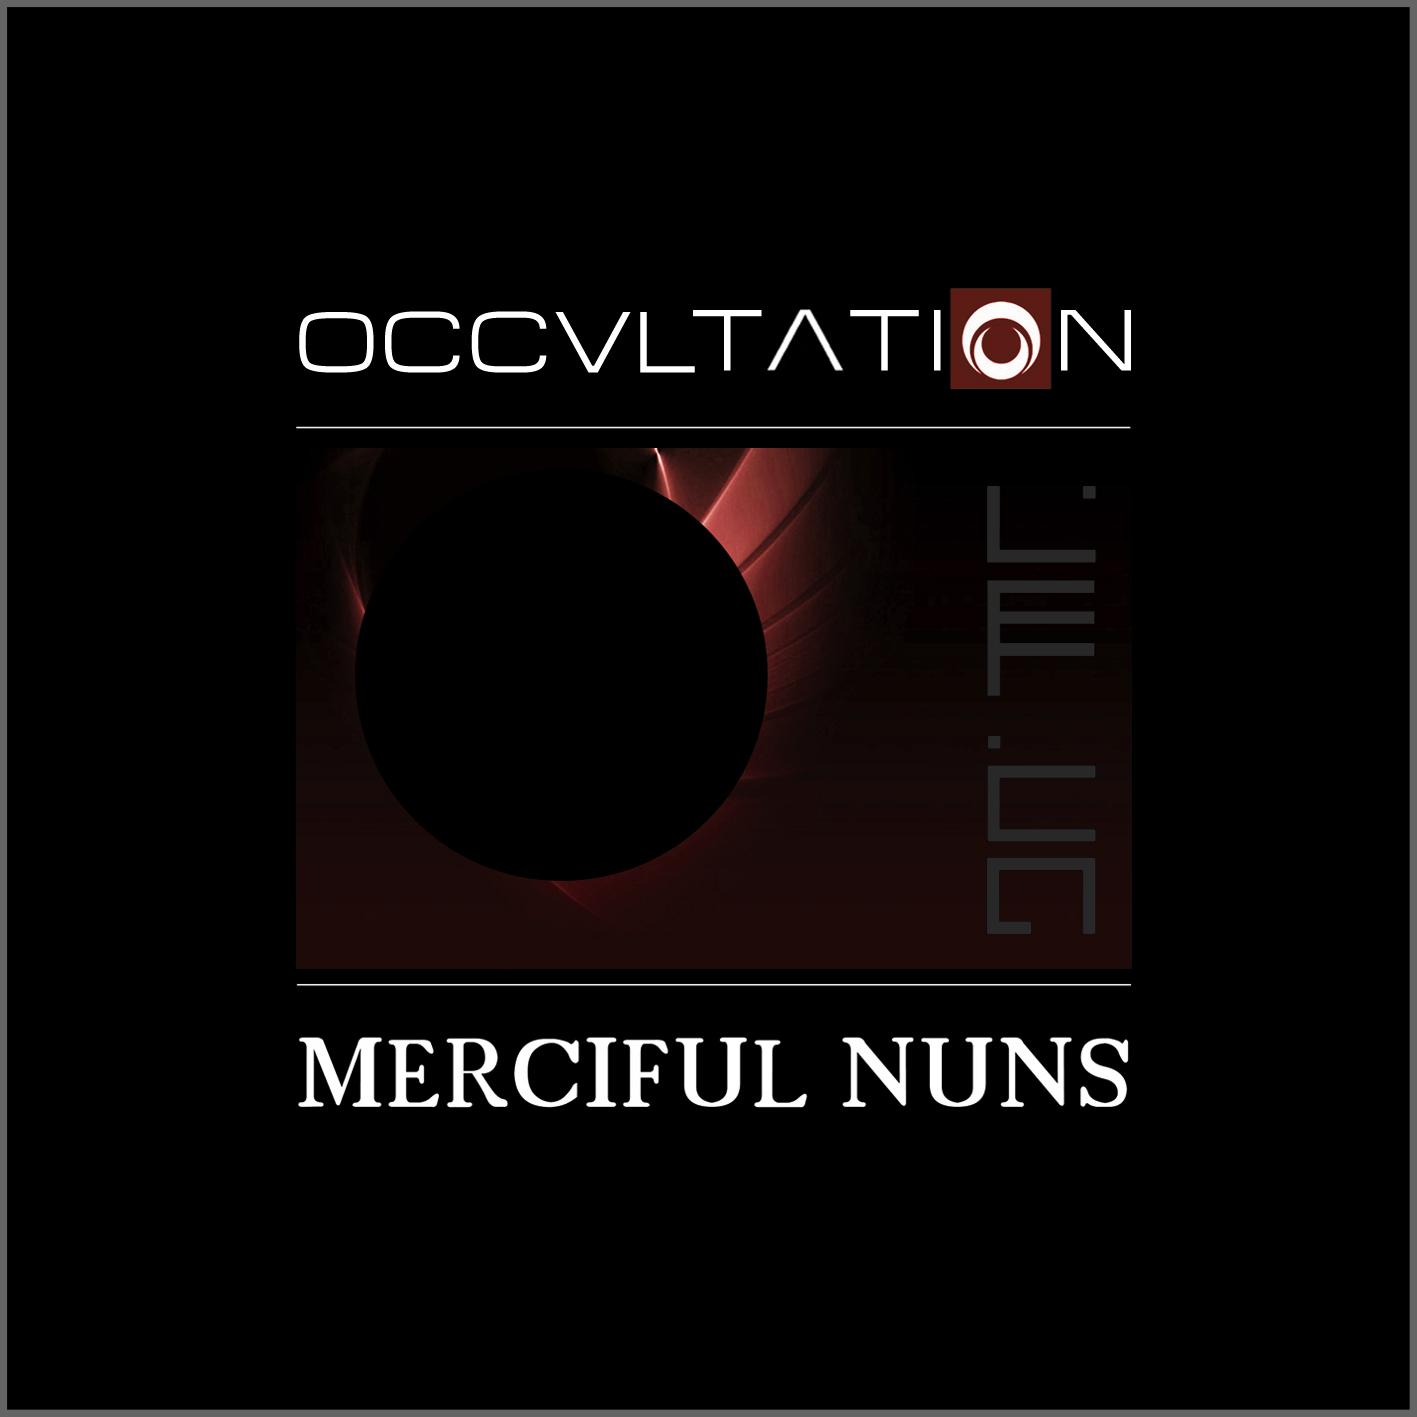 MERCIFUL NUNS Occvltation (Best Of) CD Digipack 2015 LTD.2000